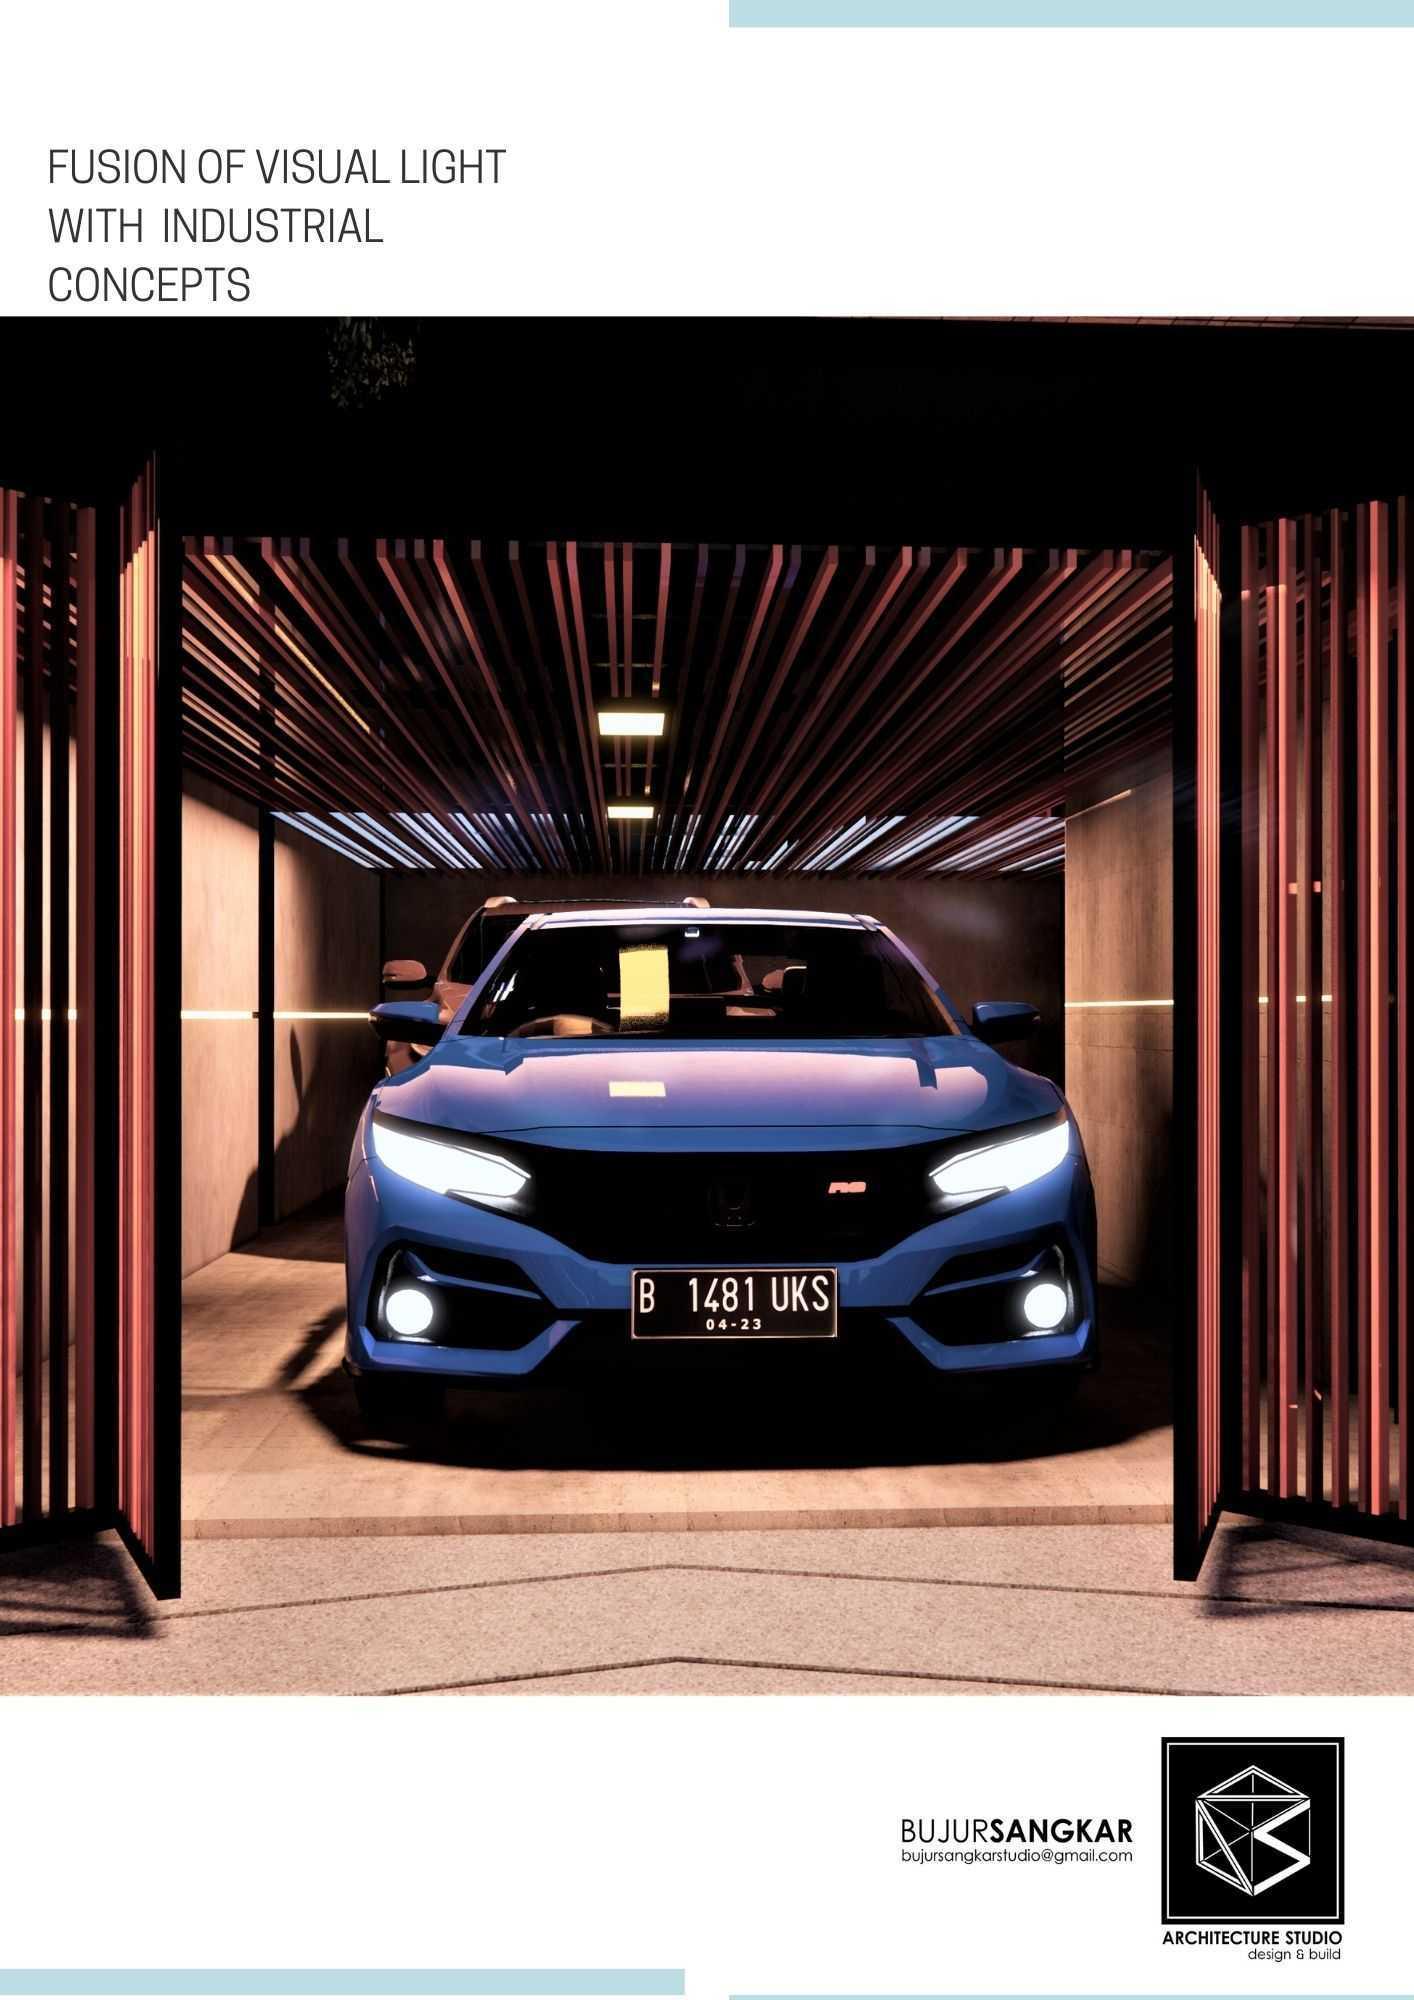 Bujursangkar Architect Fusion Of Visual Light With Industrial Concepts . Makassar, Kota Makassar, Sulawesi Selatan, Indonesia Makassar, Kota Makassar, Sulawesi Selatan, Indonesia Bujursangkar-Architect-Fusion-Of-Visual-Light-With-Industrial-Concepts-   111335